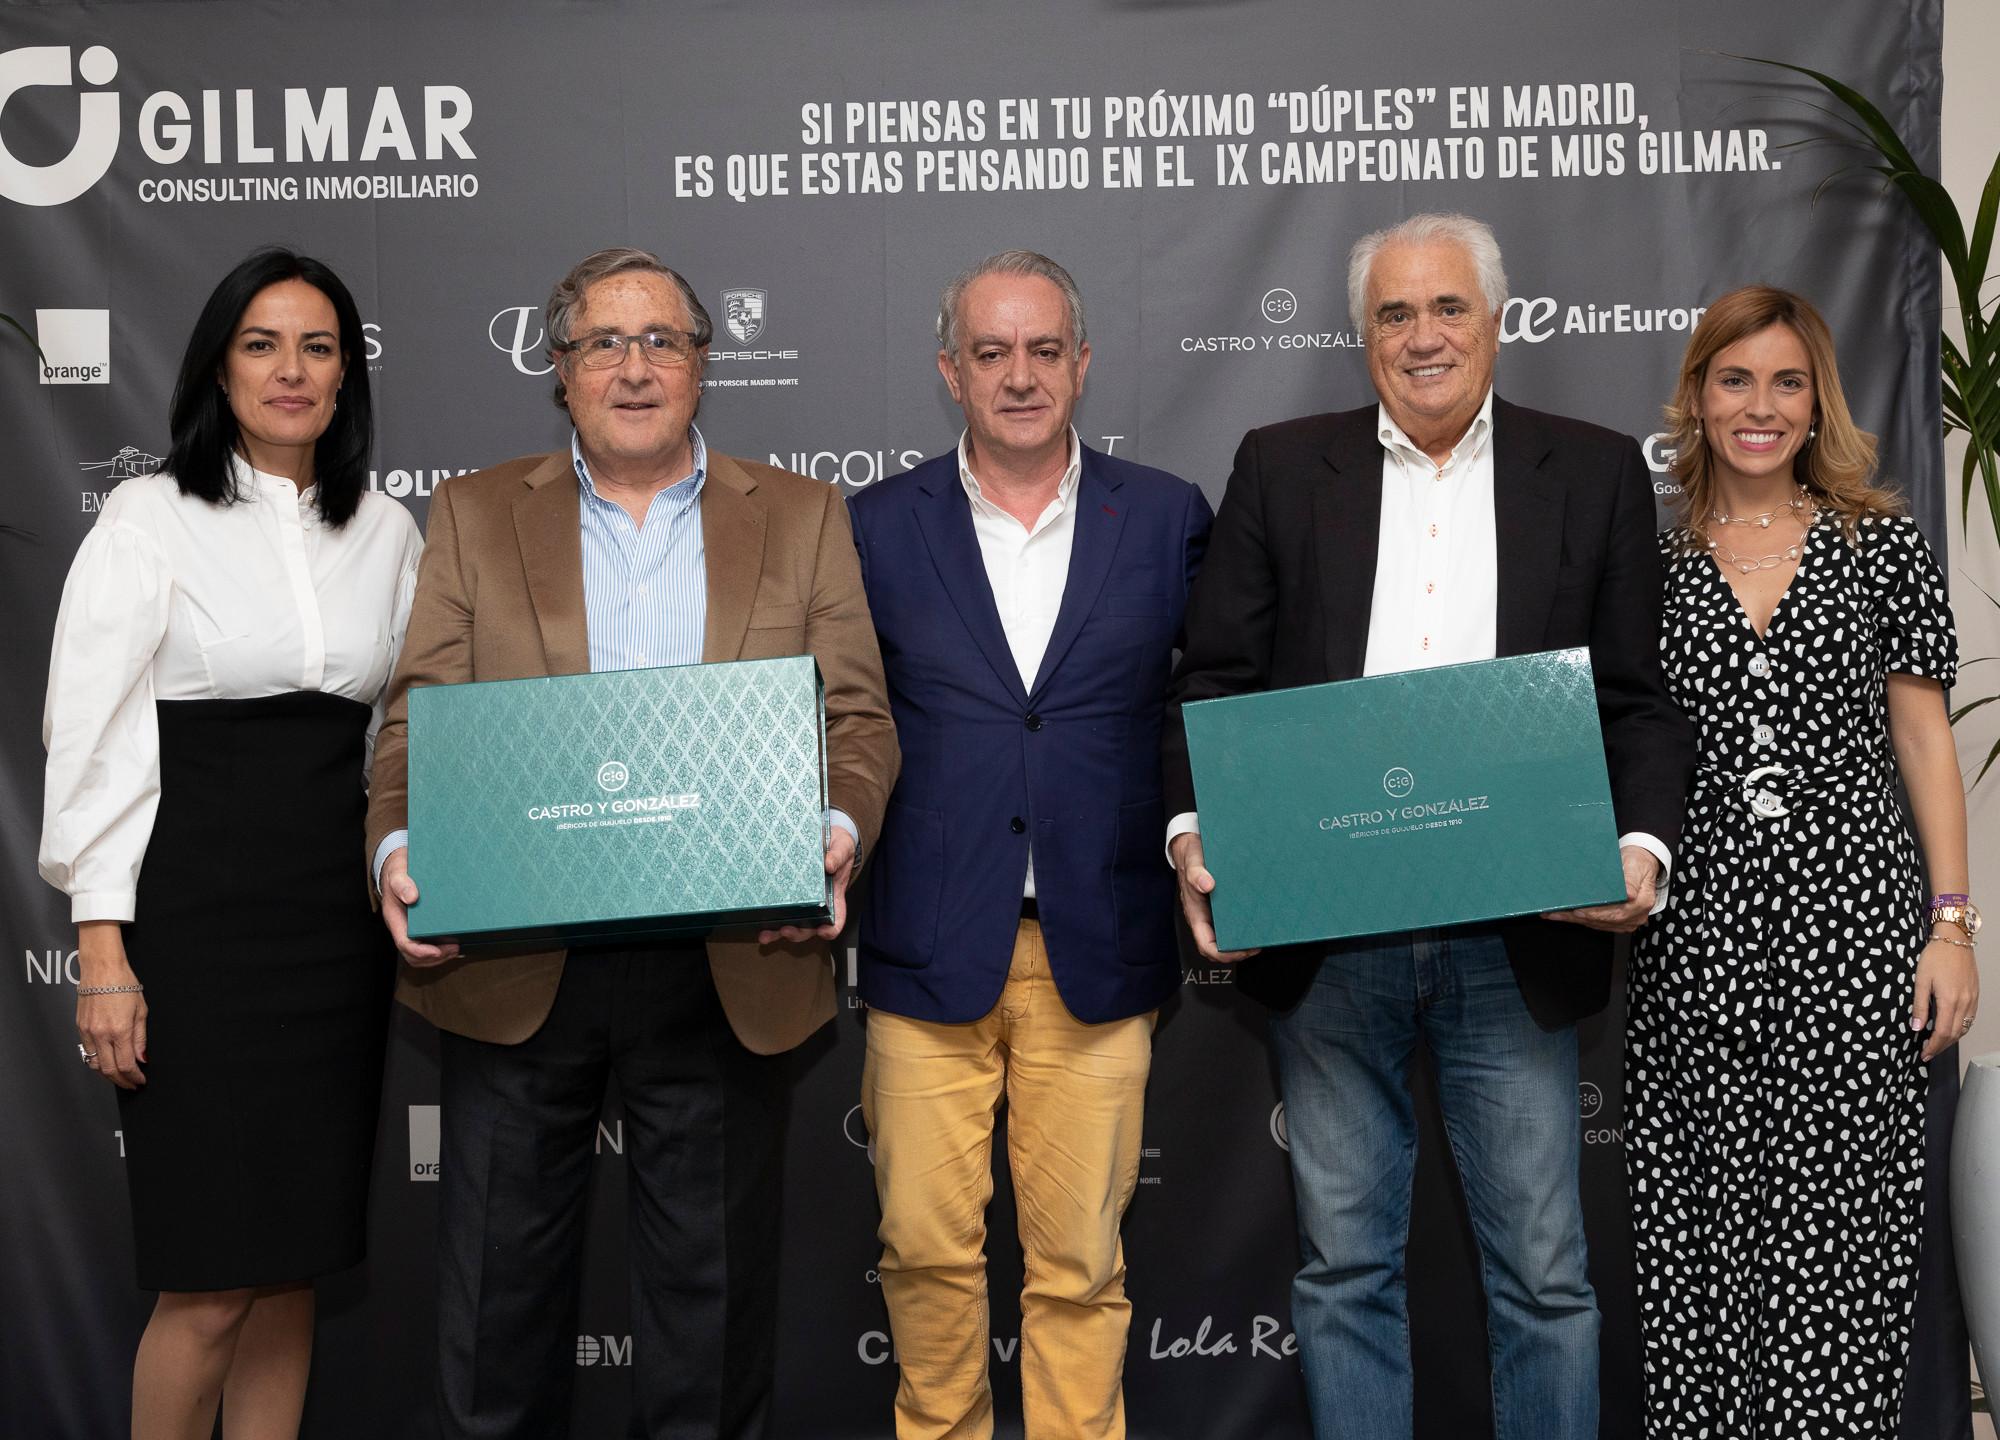 Premio Castro y González